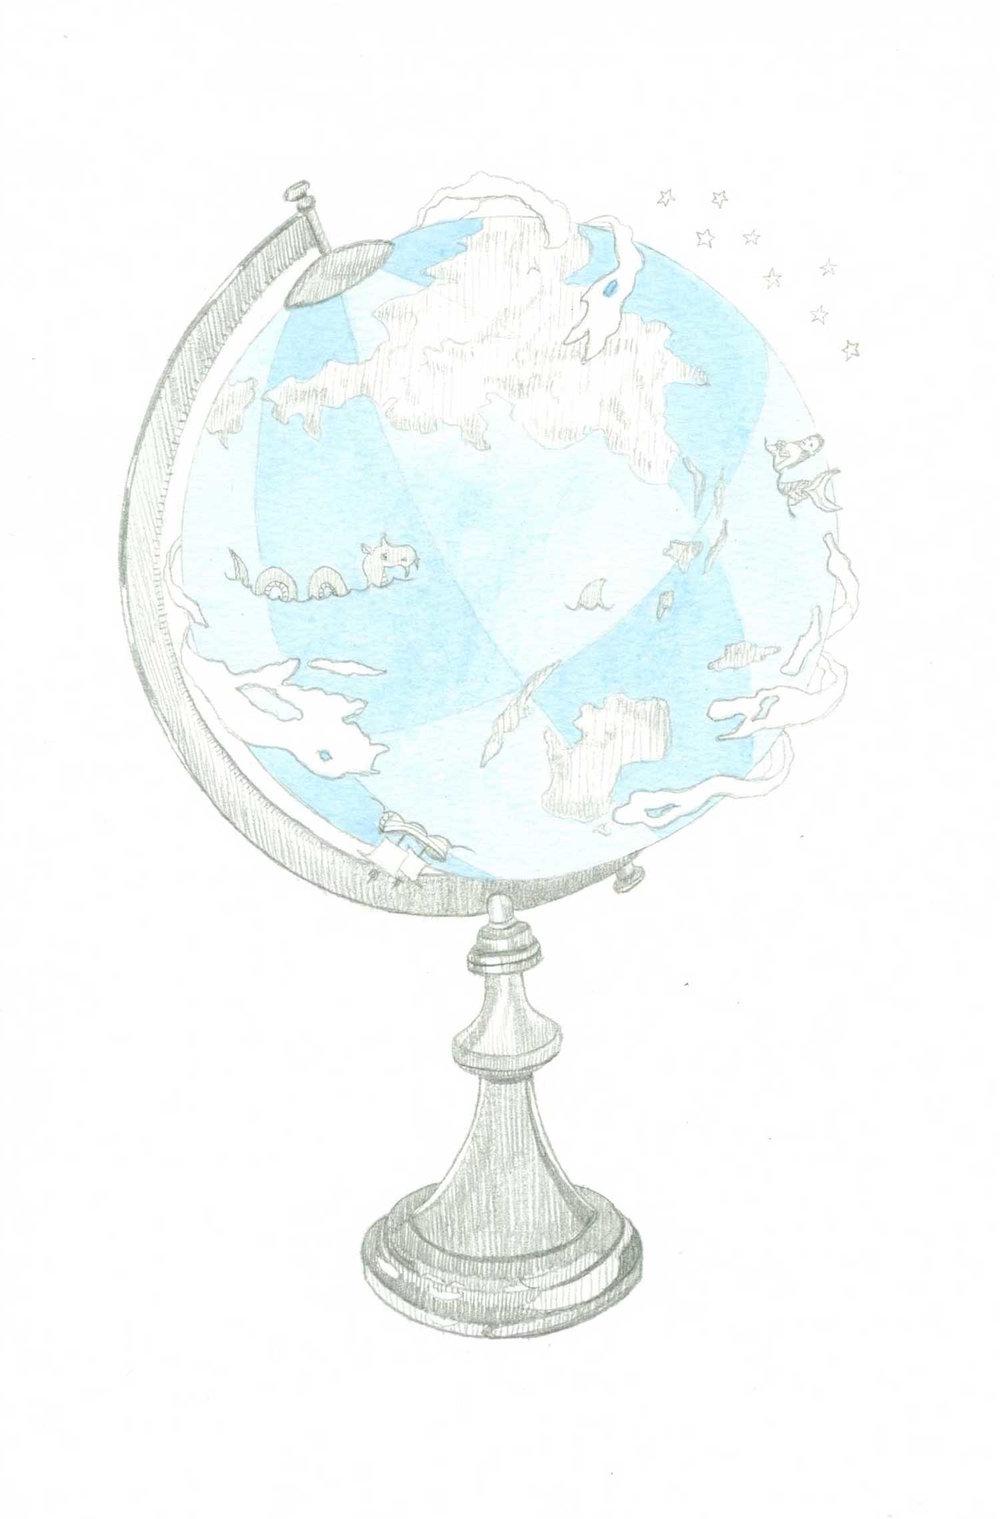 Camille Serisier, 2012, Illustration for Creative Non Fiction Magazine, © Camille Serisier